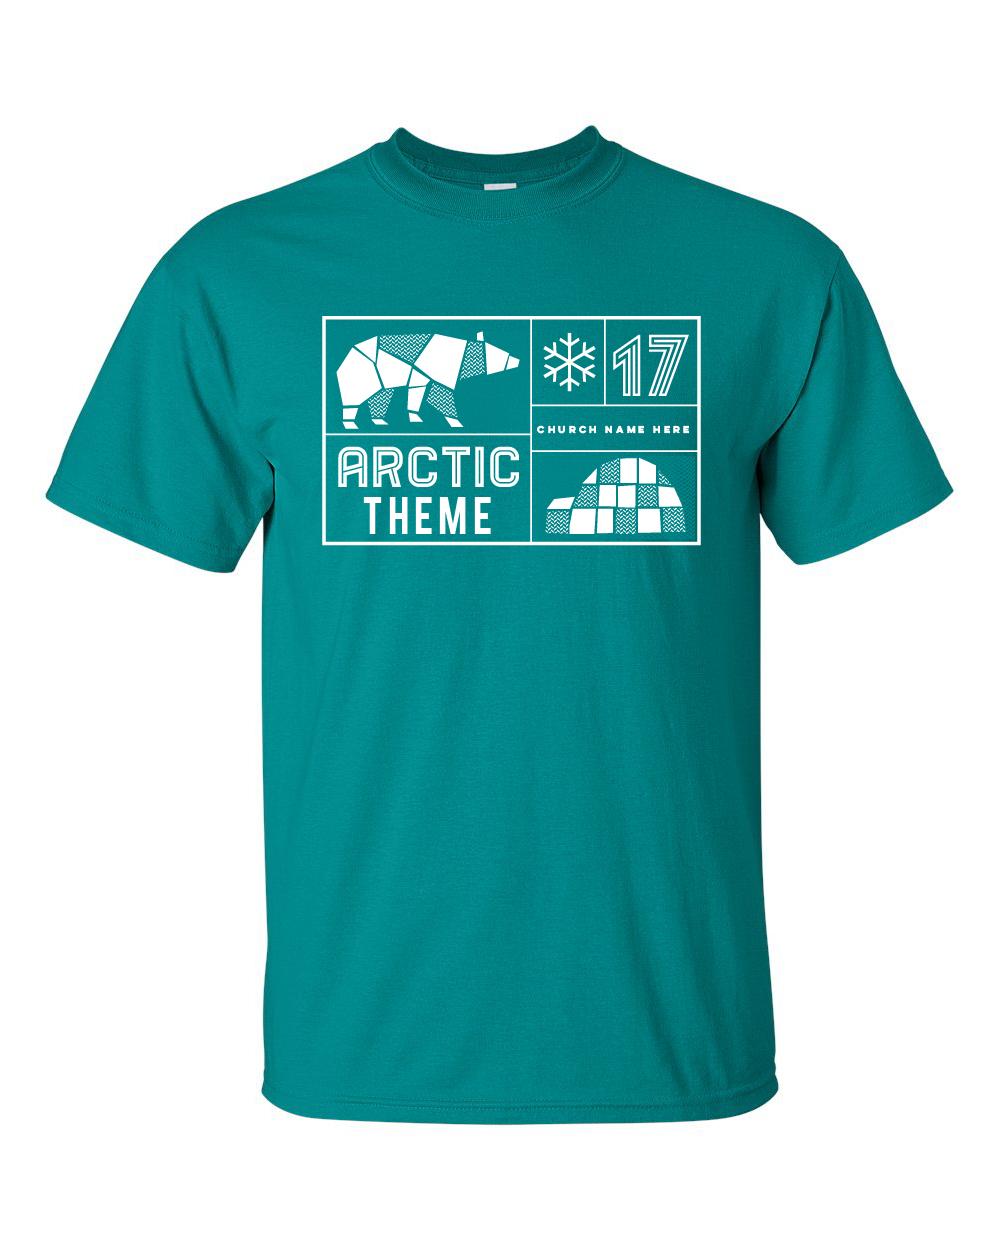 Arctic 1-03.jpg